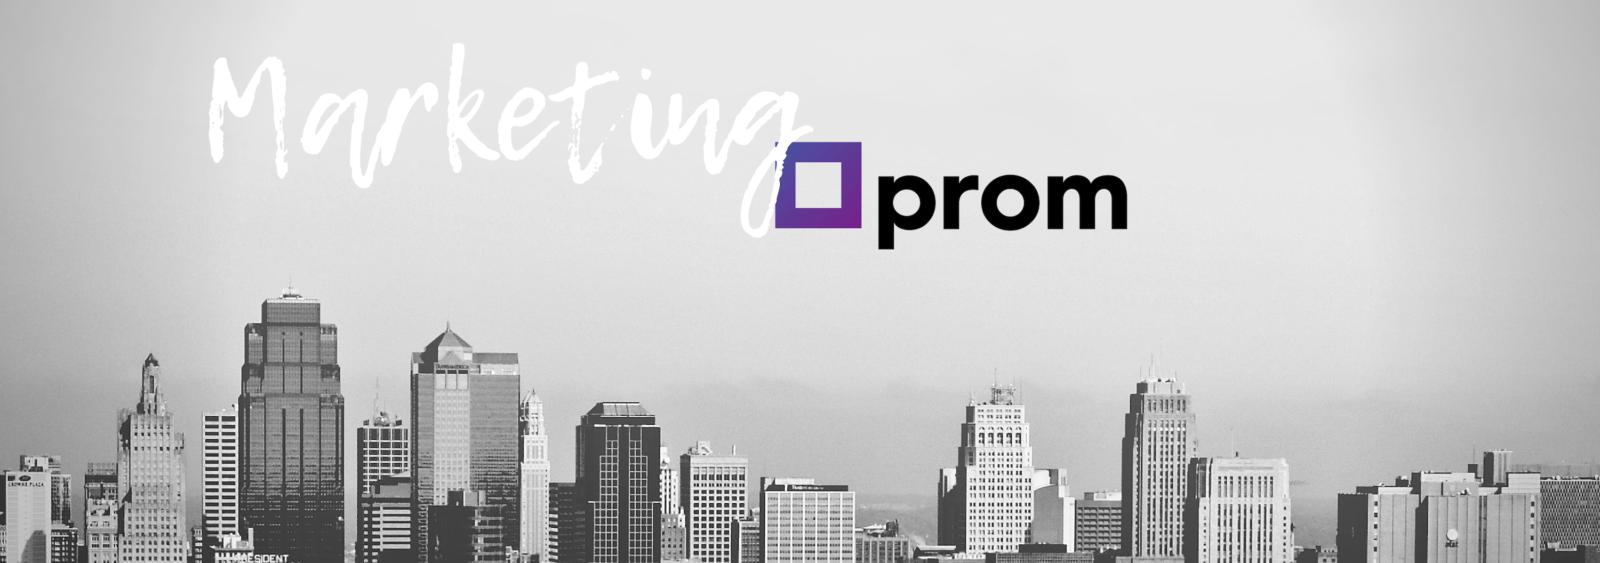 создание и продвижение бизнес аккаунта на портале Prom.ua